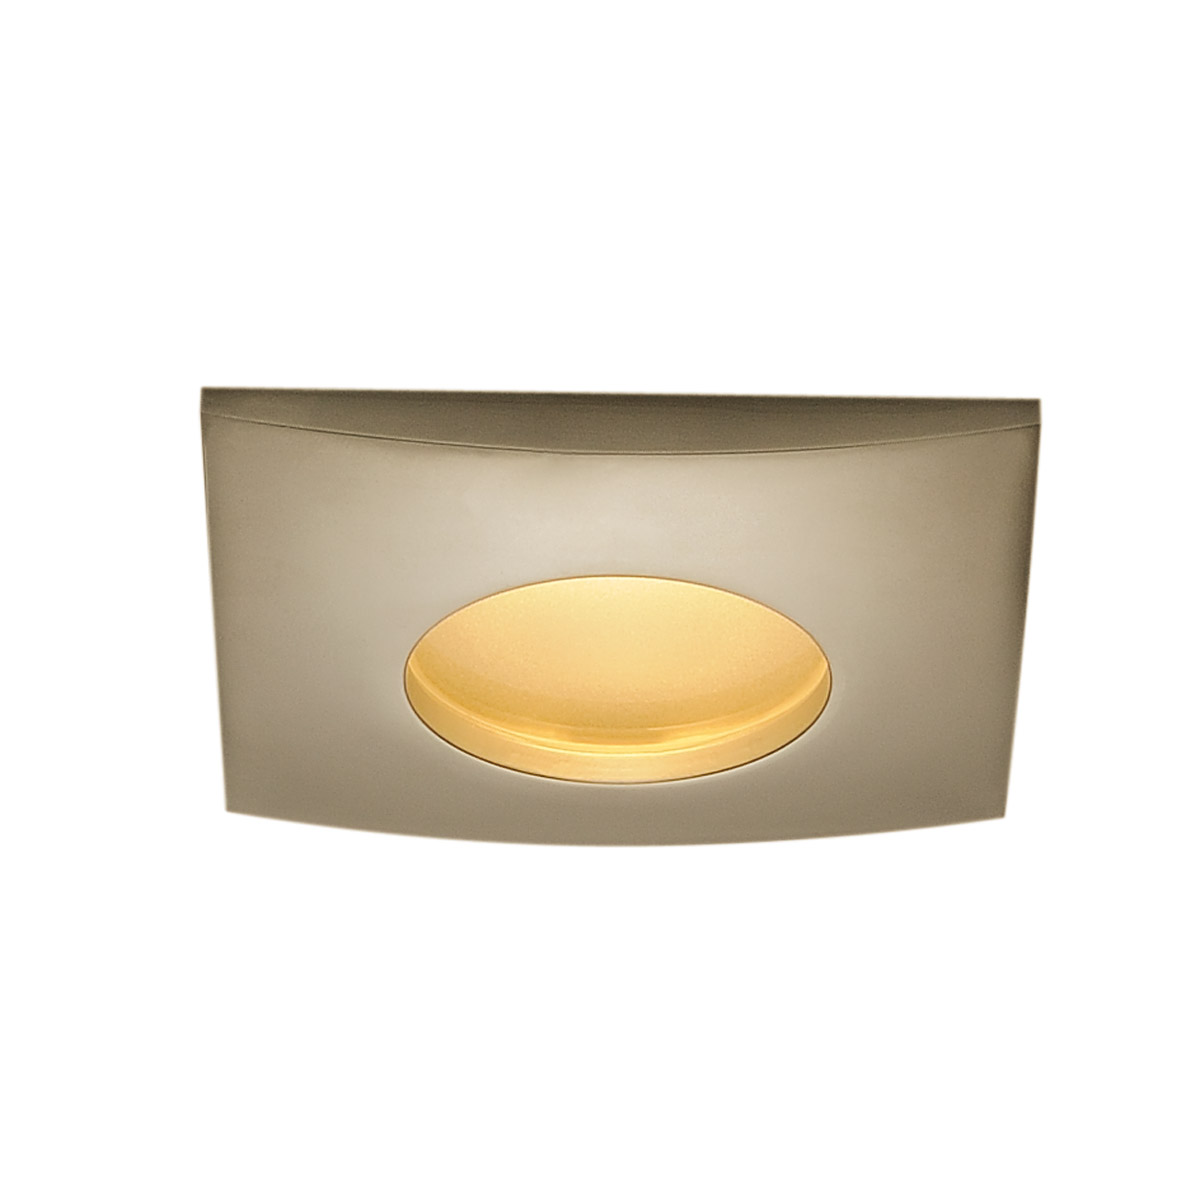 1 Stk OUT 65 LED DL SQUARE Set, 9W 3000K 38°, inkl. Treiber, titan LI114477--